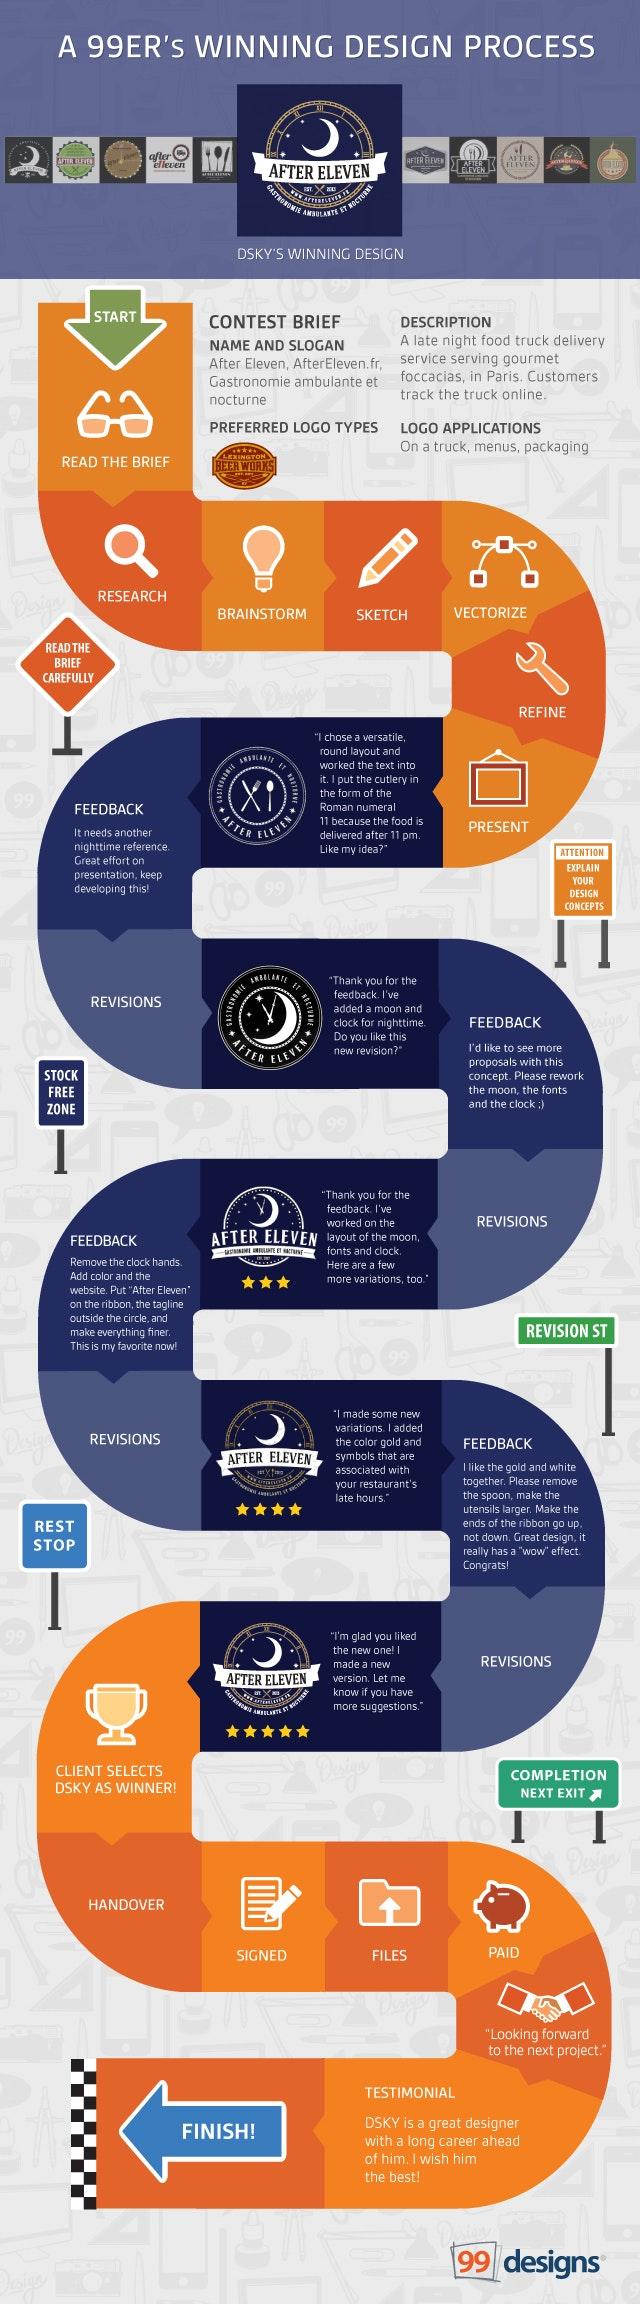 Winning Design Infographic 99